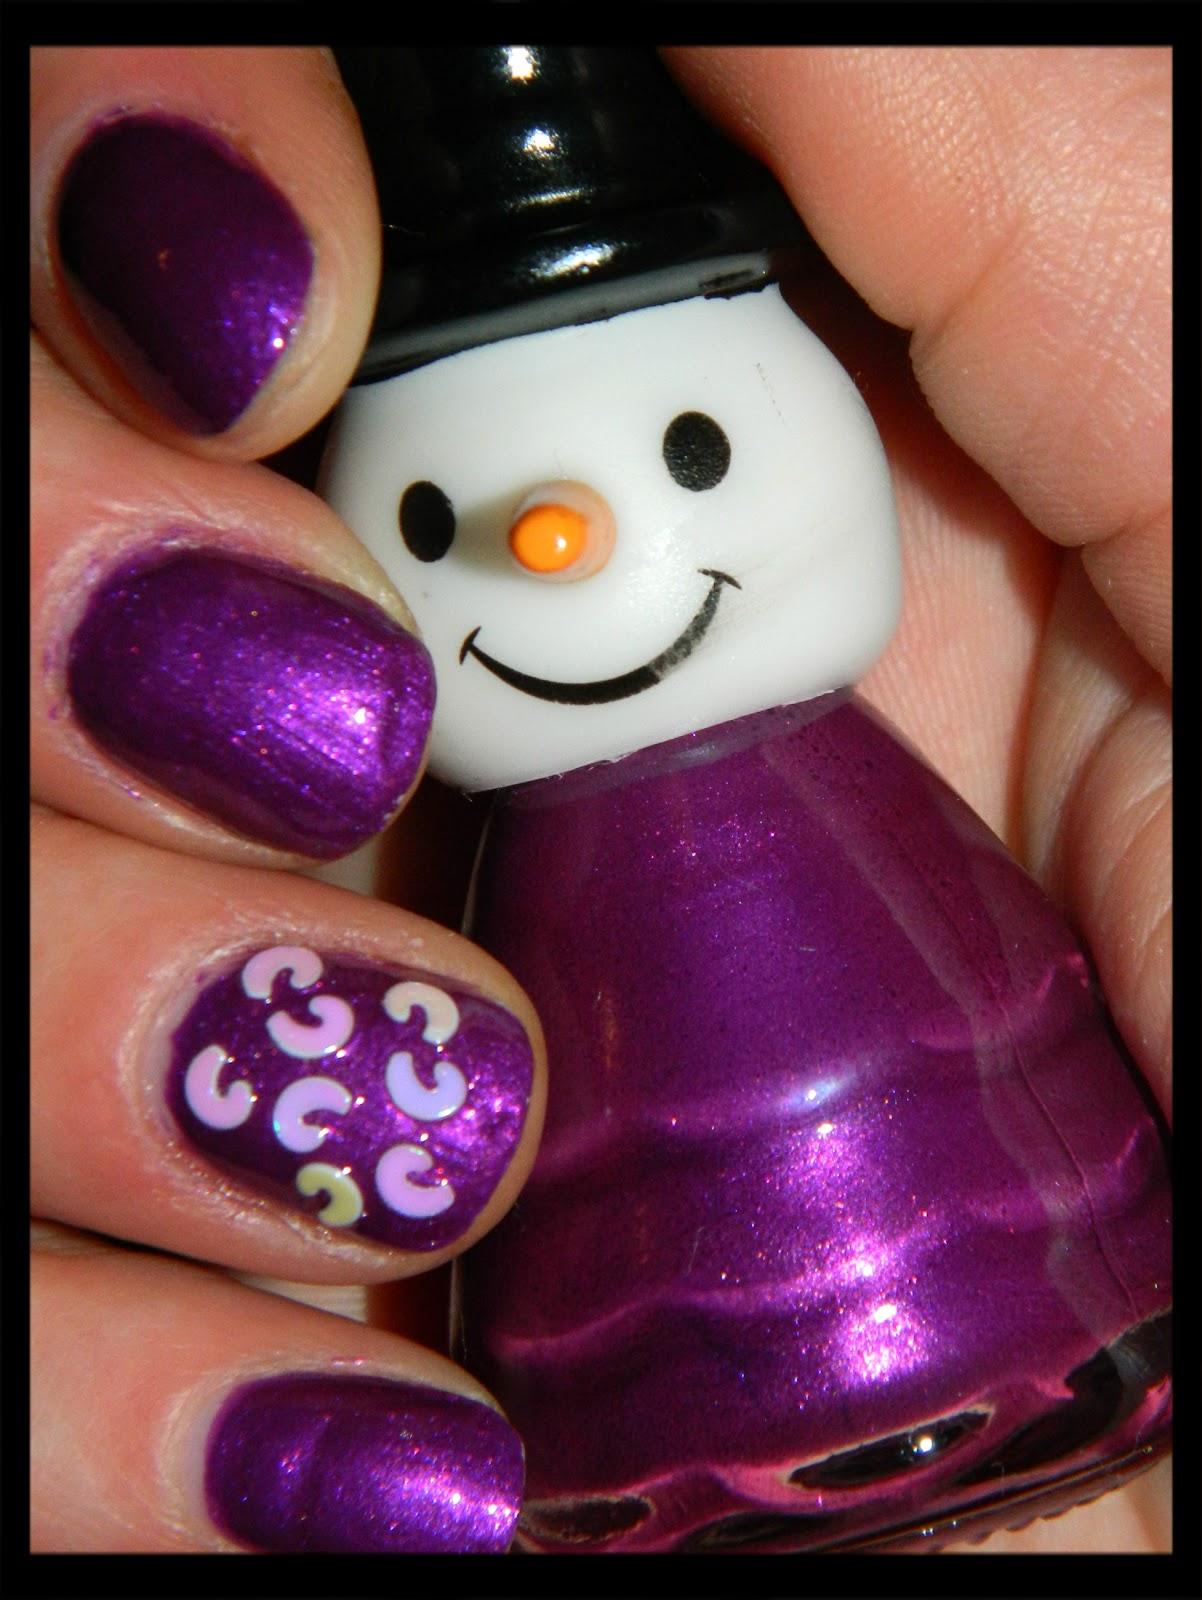 cutting edge polish : snowman shaped nail polish from family dollar ...